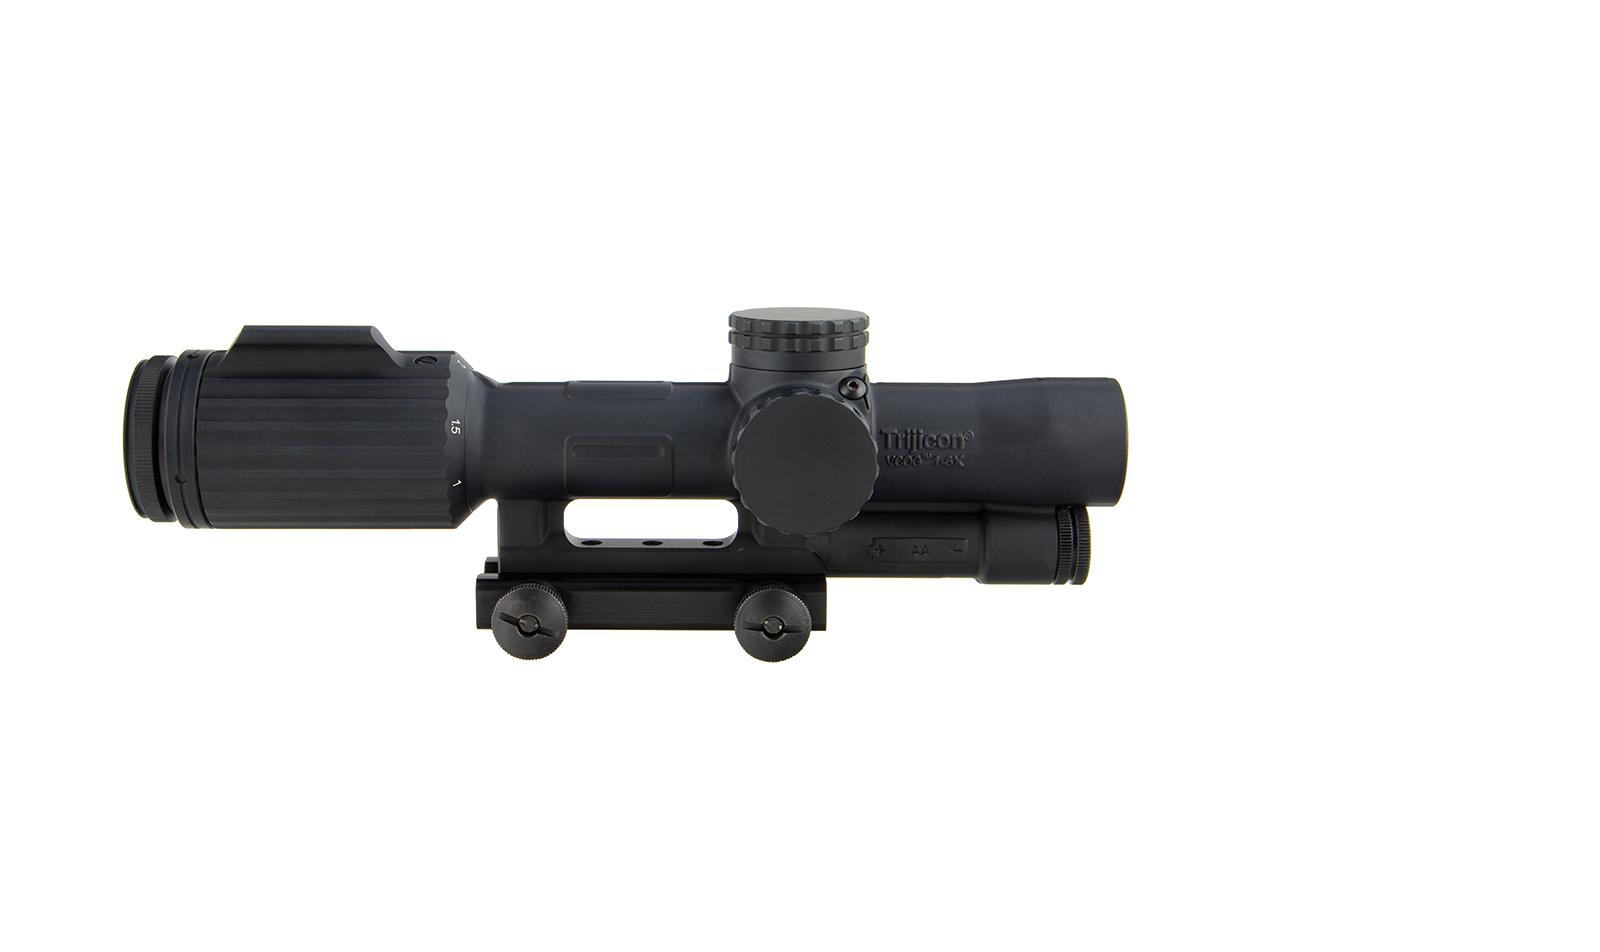 VC16-C-1600042 angle 6